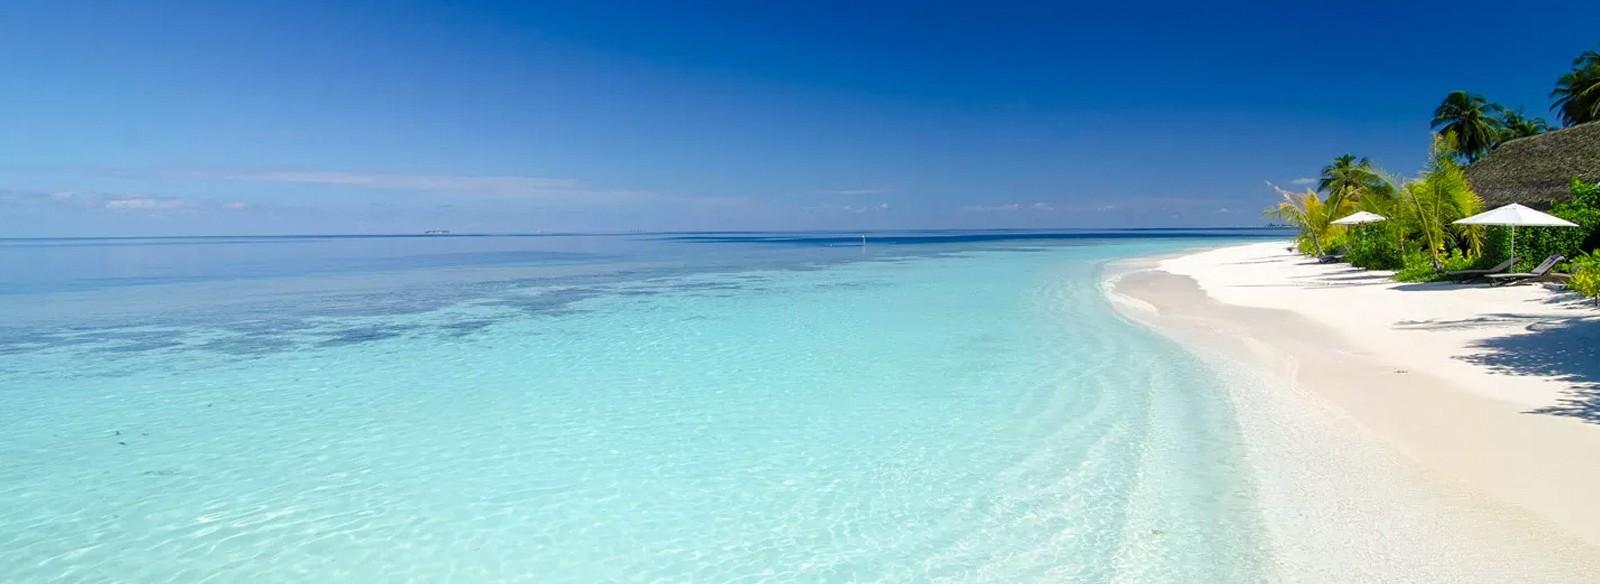 PD-Header-Kandolhu-Island-water-villa-top-10-1600x700